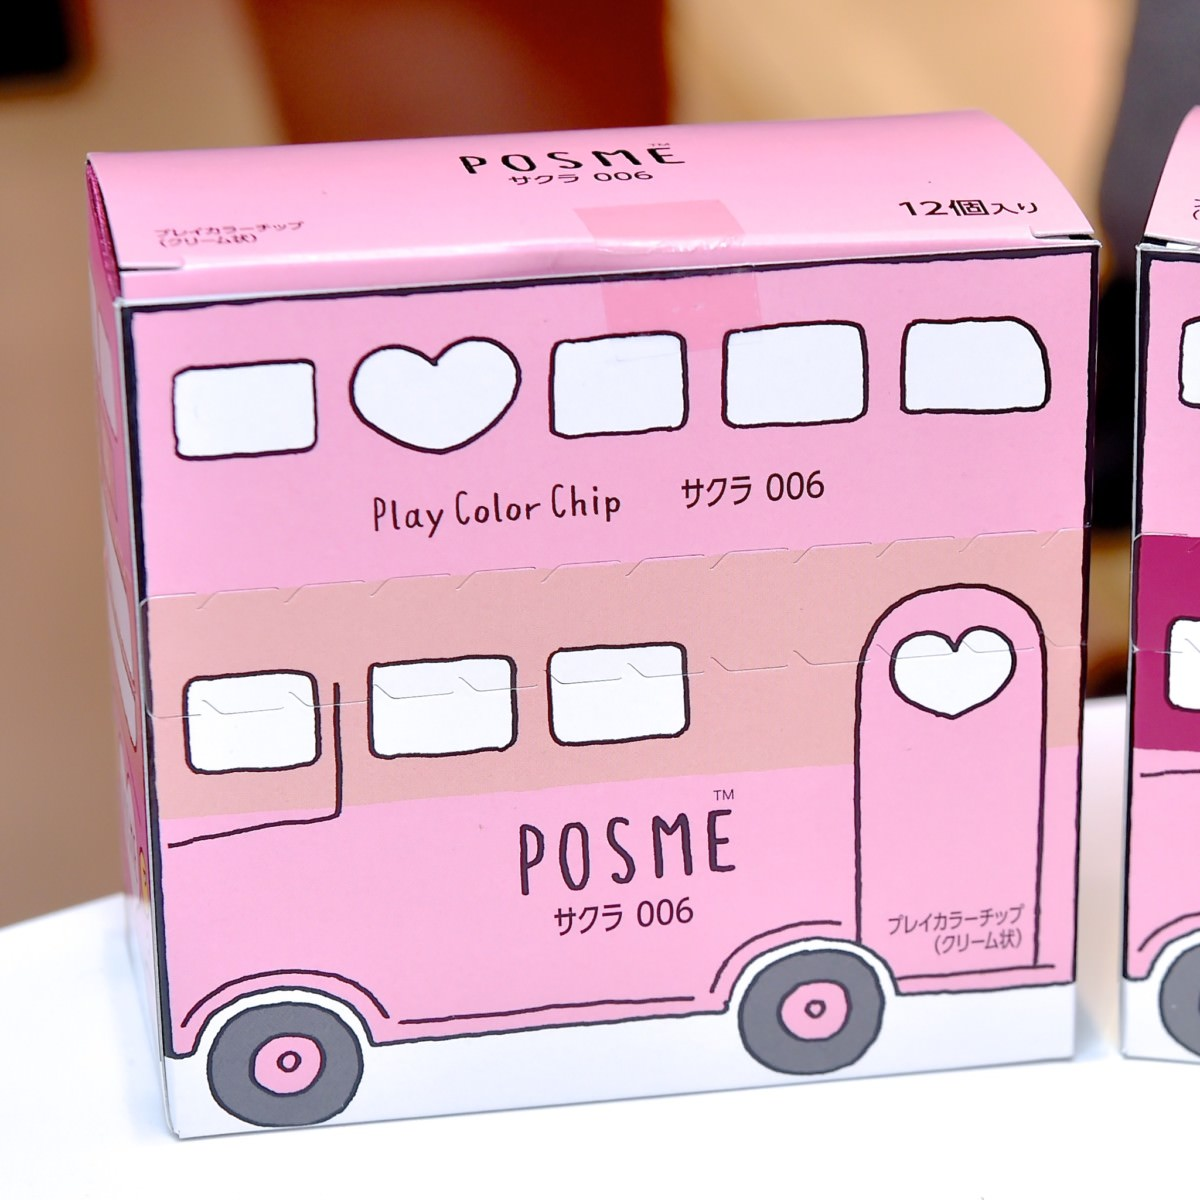 POSME(ポスメ)第1弾「Play Color Chip (プレイカラーチップ)」3